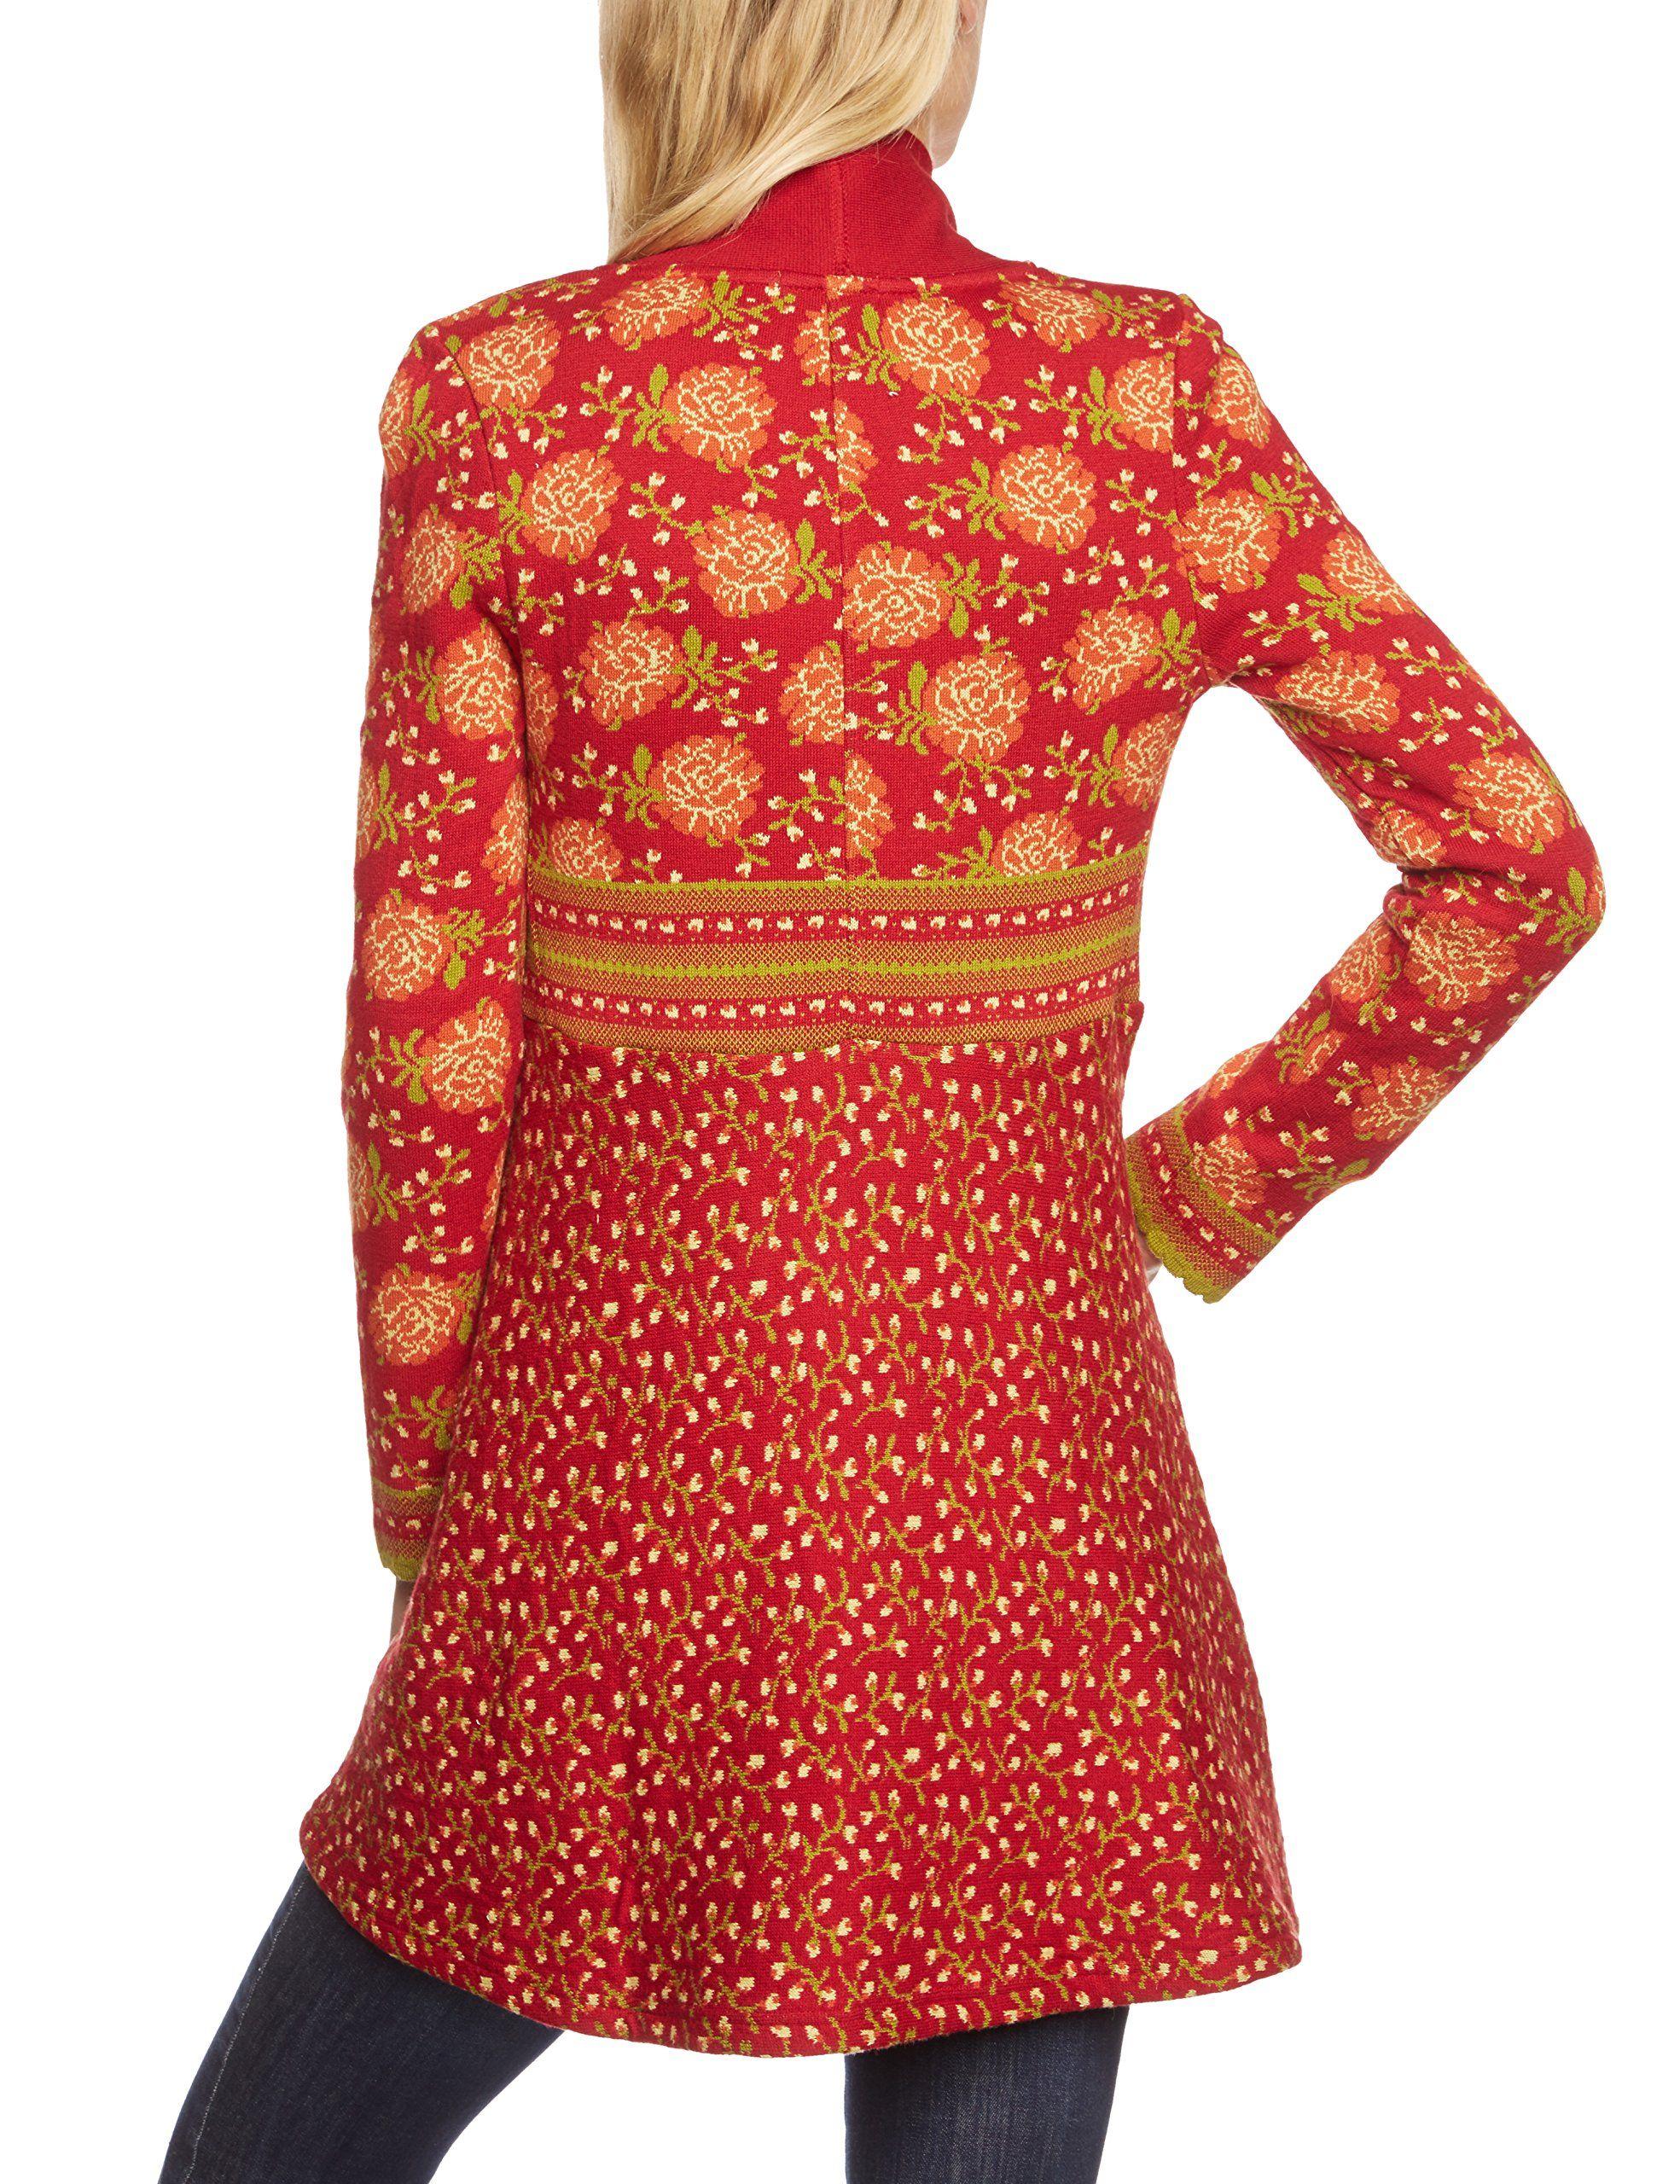 Lana natural wear Damen Strickjacke Jolina lang: